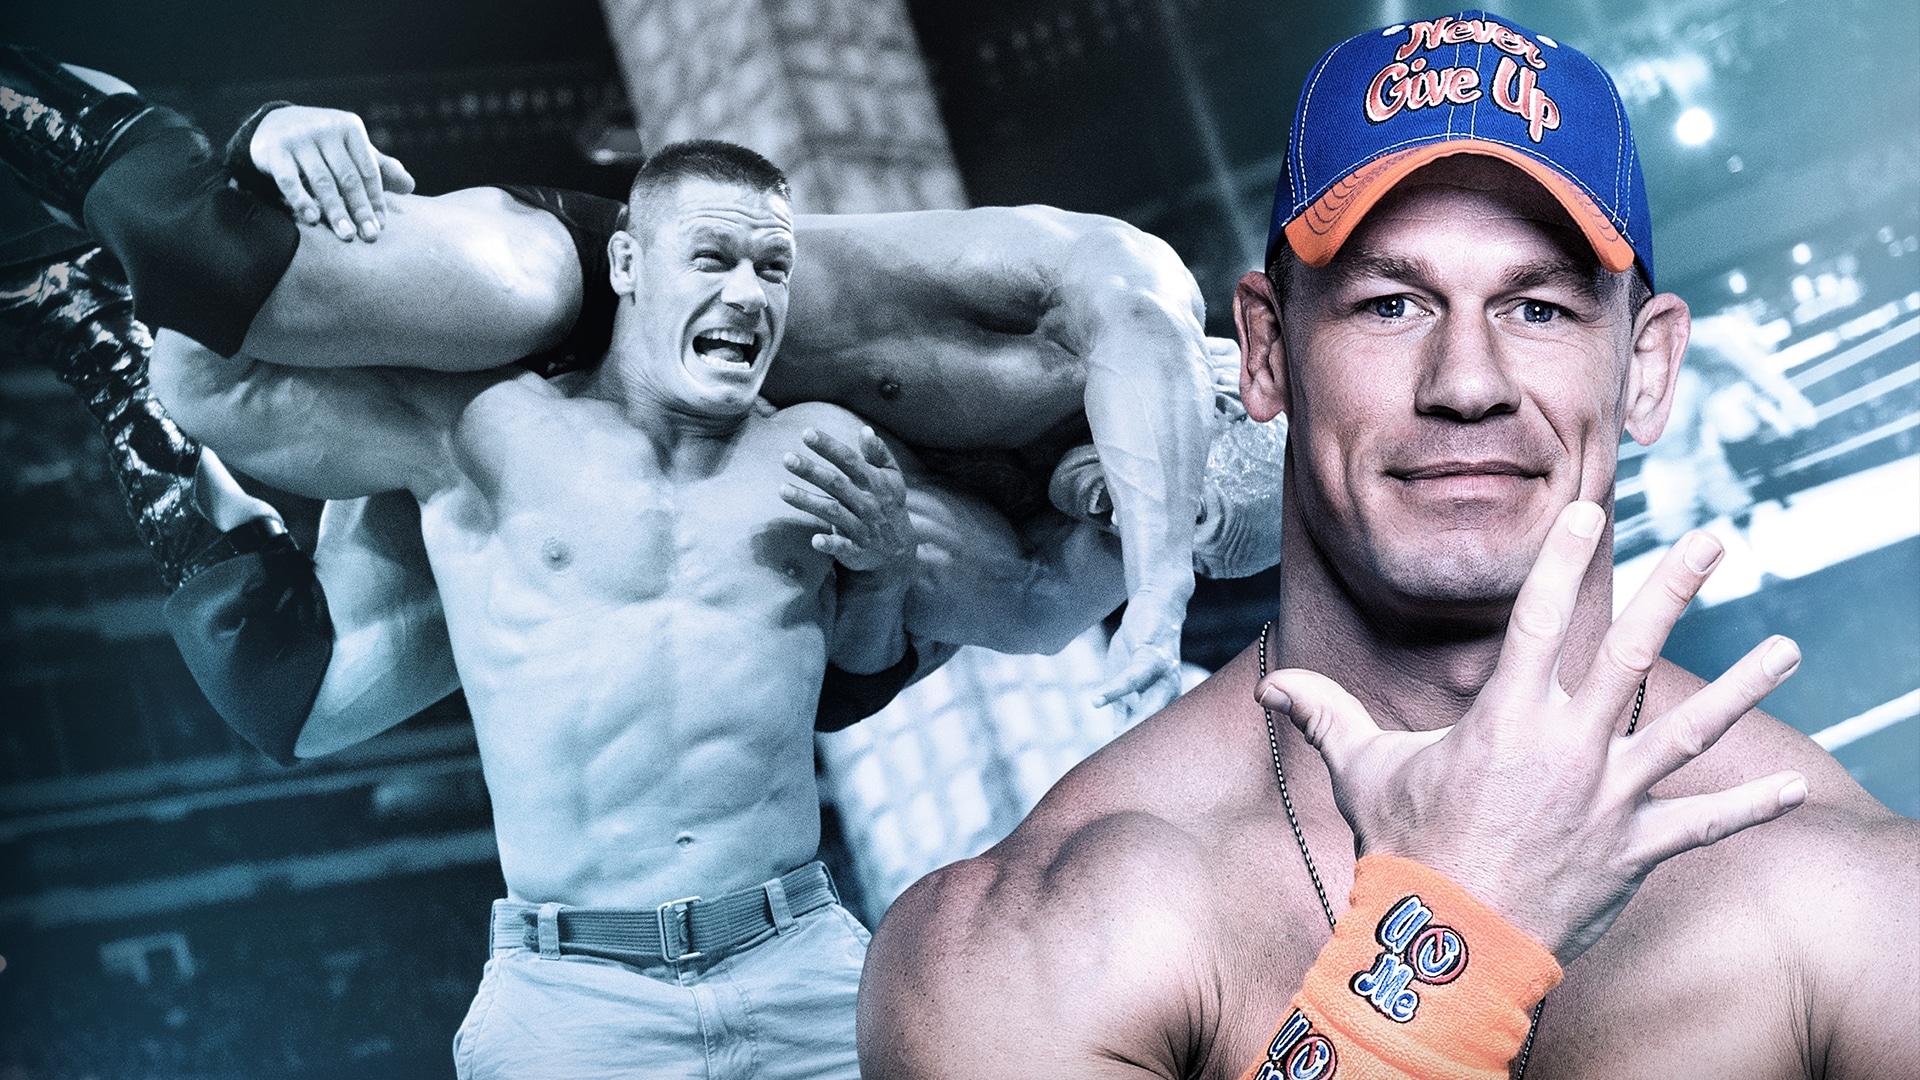 John Cena's Best WrestleMania Matches